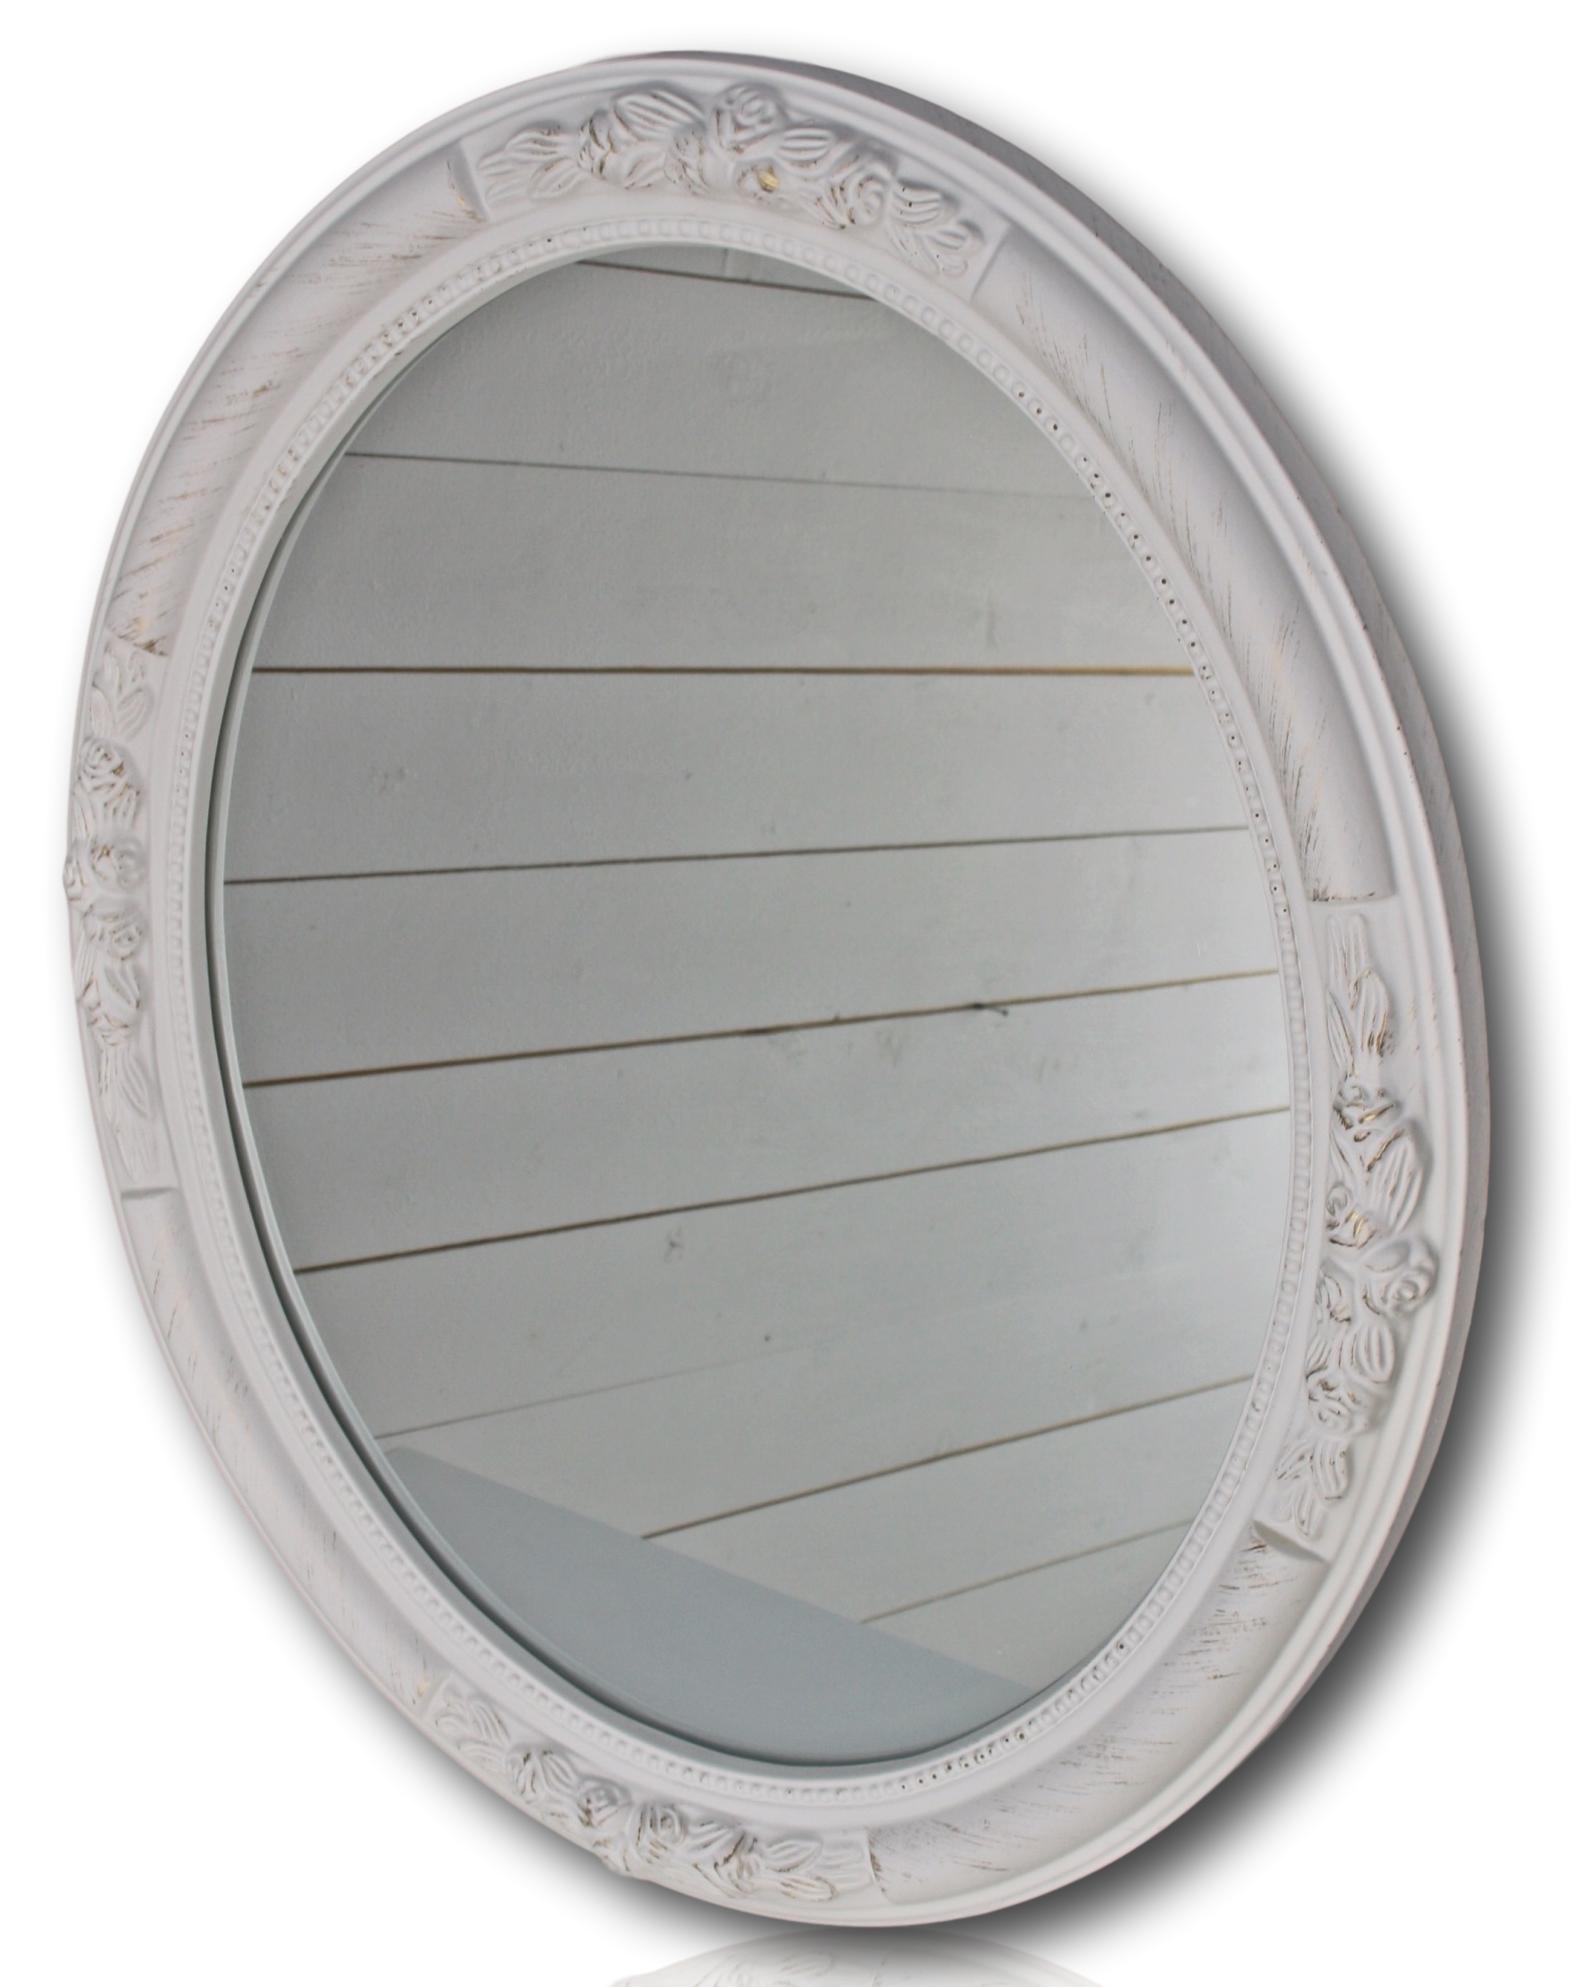 wandspiegel spiegel oval neu wei holz verzierungen barock barockspiegel antik ebay. Black Bedroom Furniture Sets. Home Design Ideas